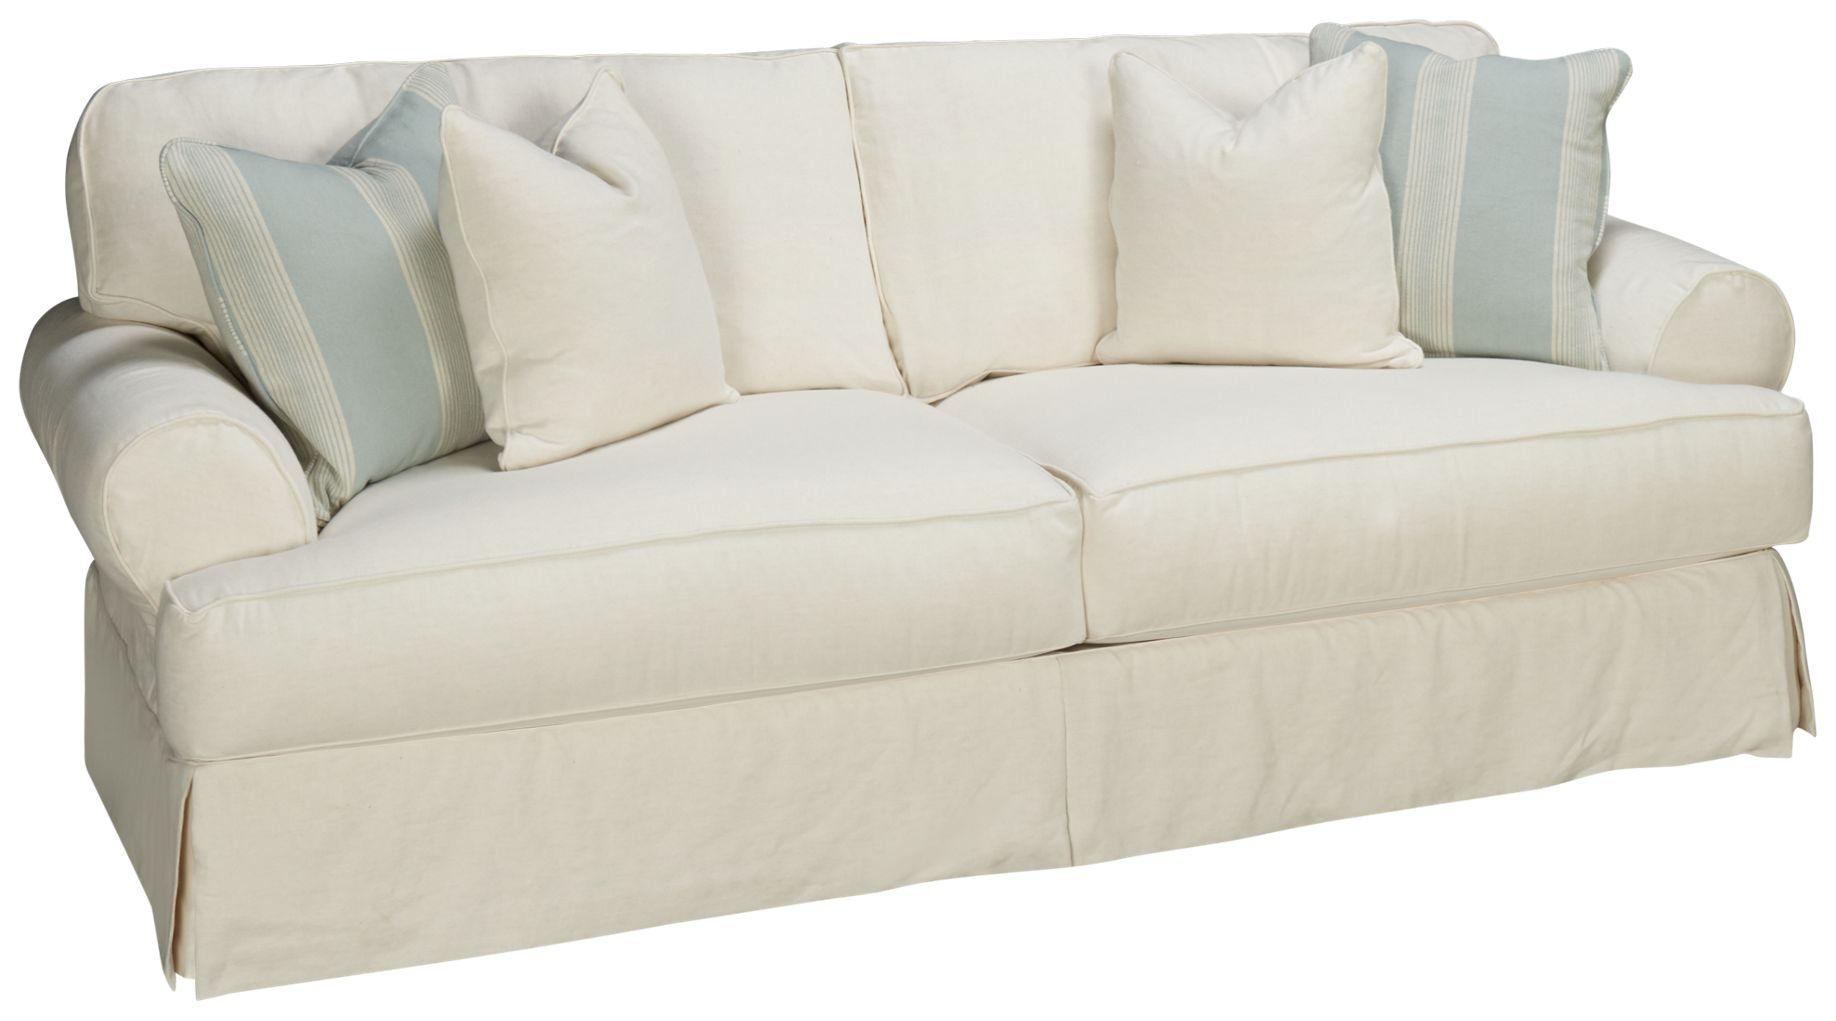 rowe addison rowe addison sofa with slipcover jordan s furniture rowe addison sofa with slipcover